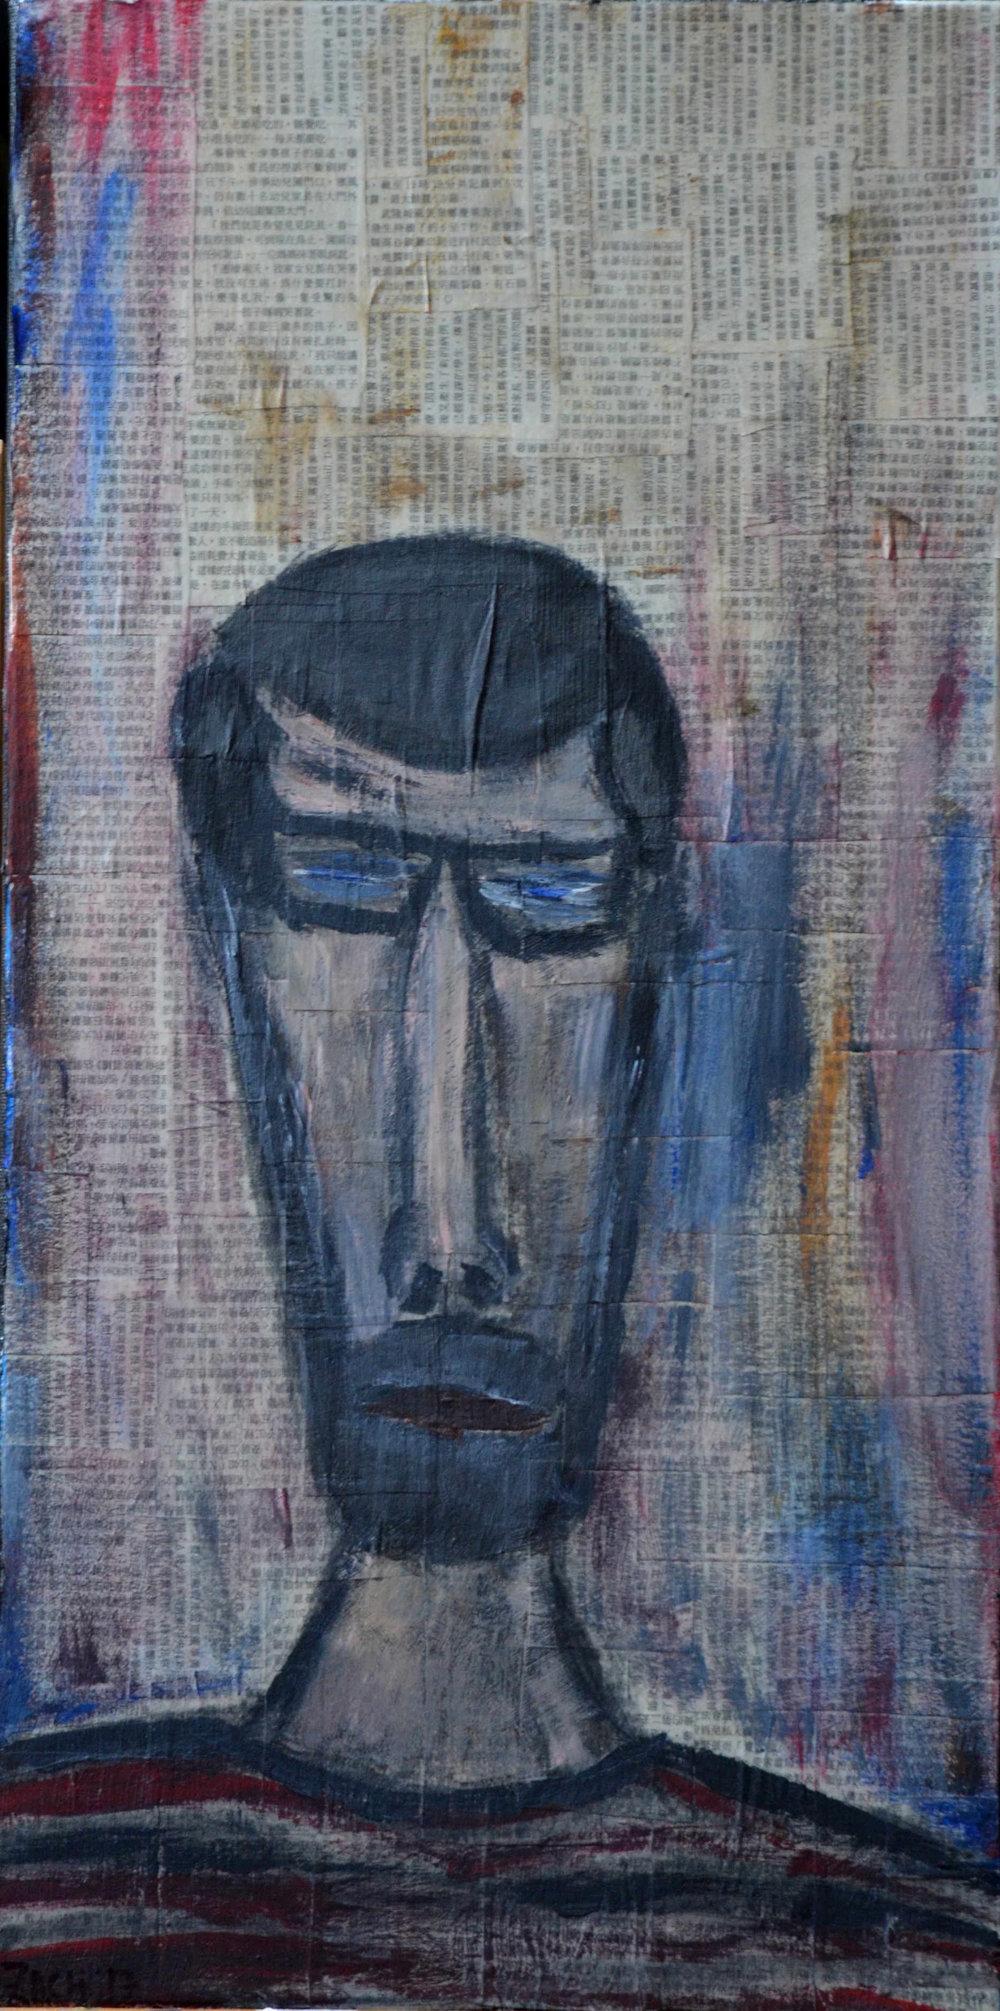 Self-Portrait #11